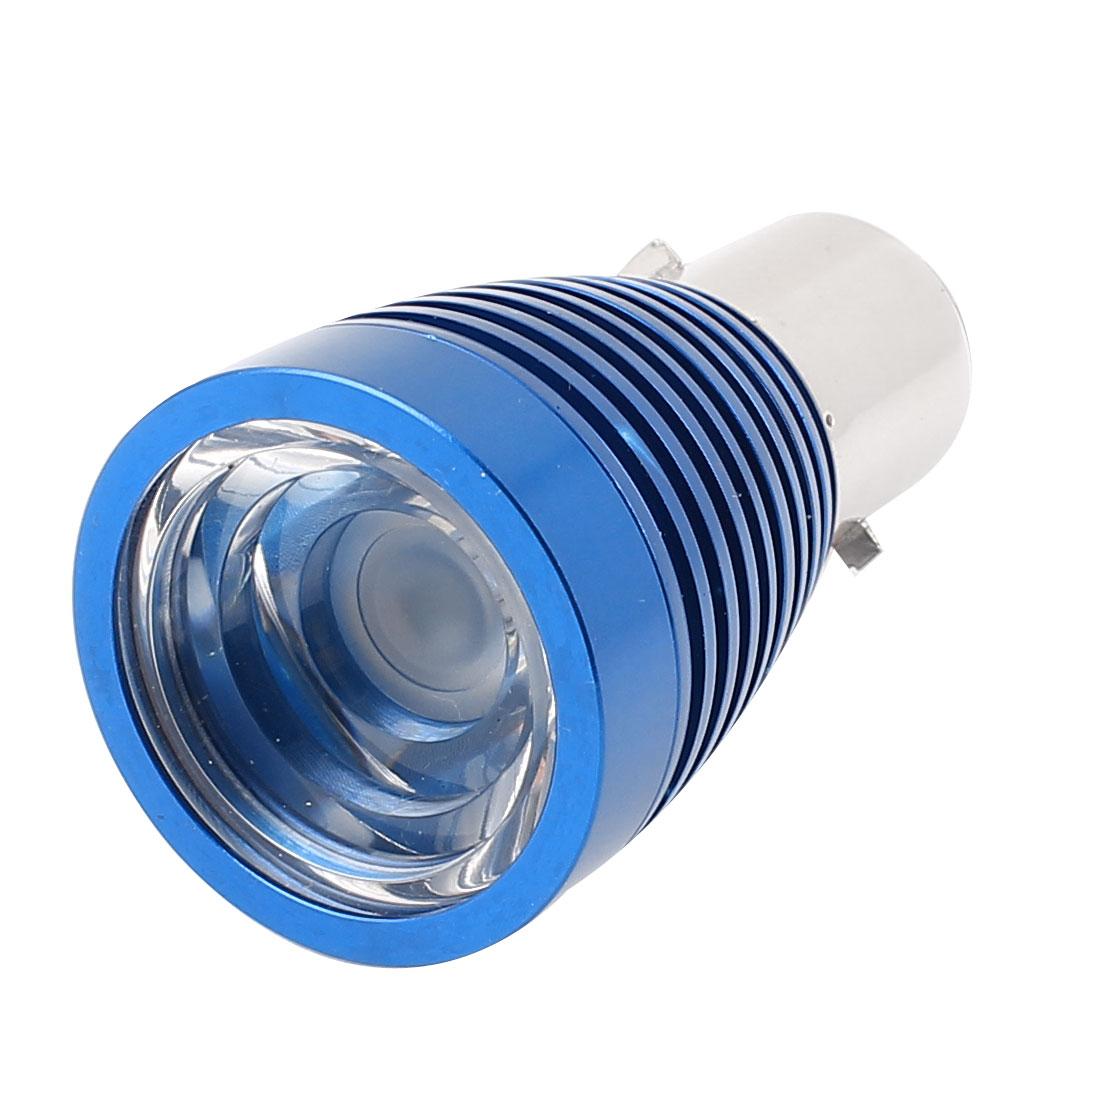 DC 12-80V 5W White LED Decoration Light Lamp for Motorbike Motorcycle